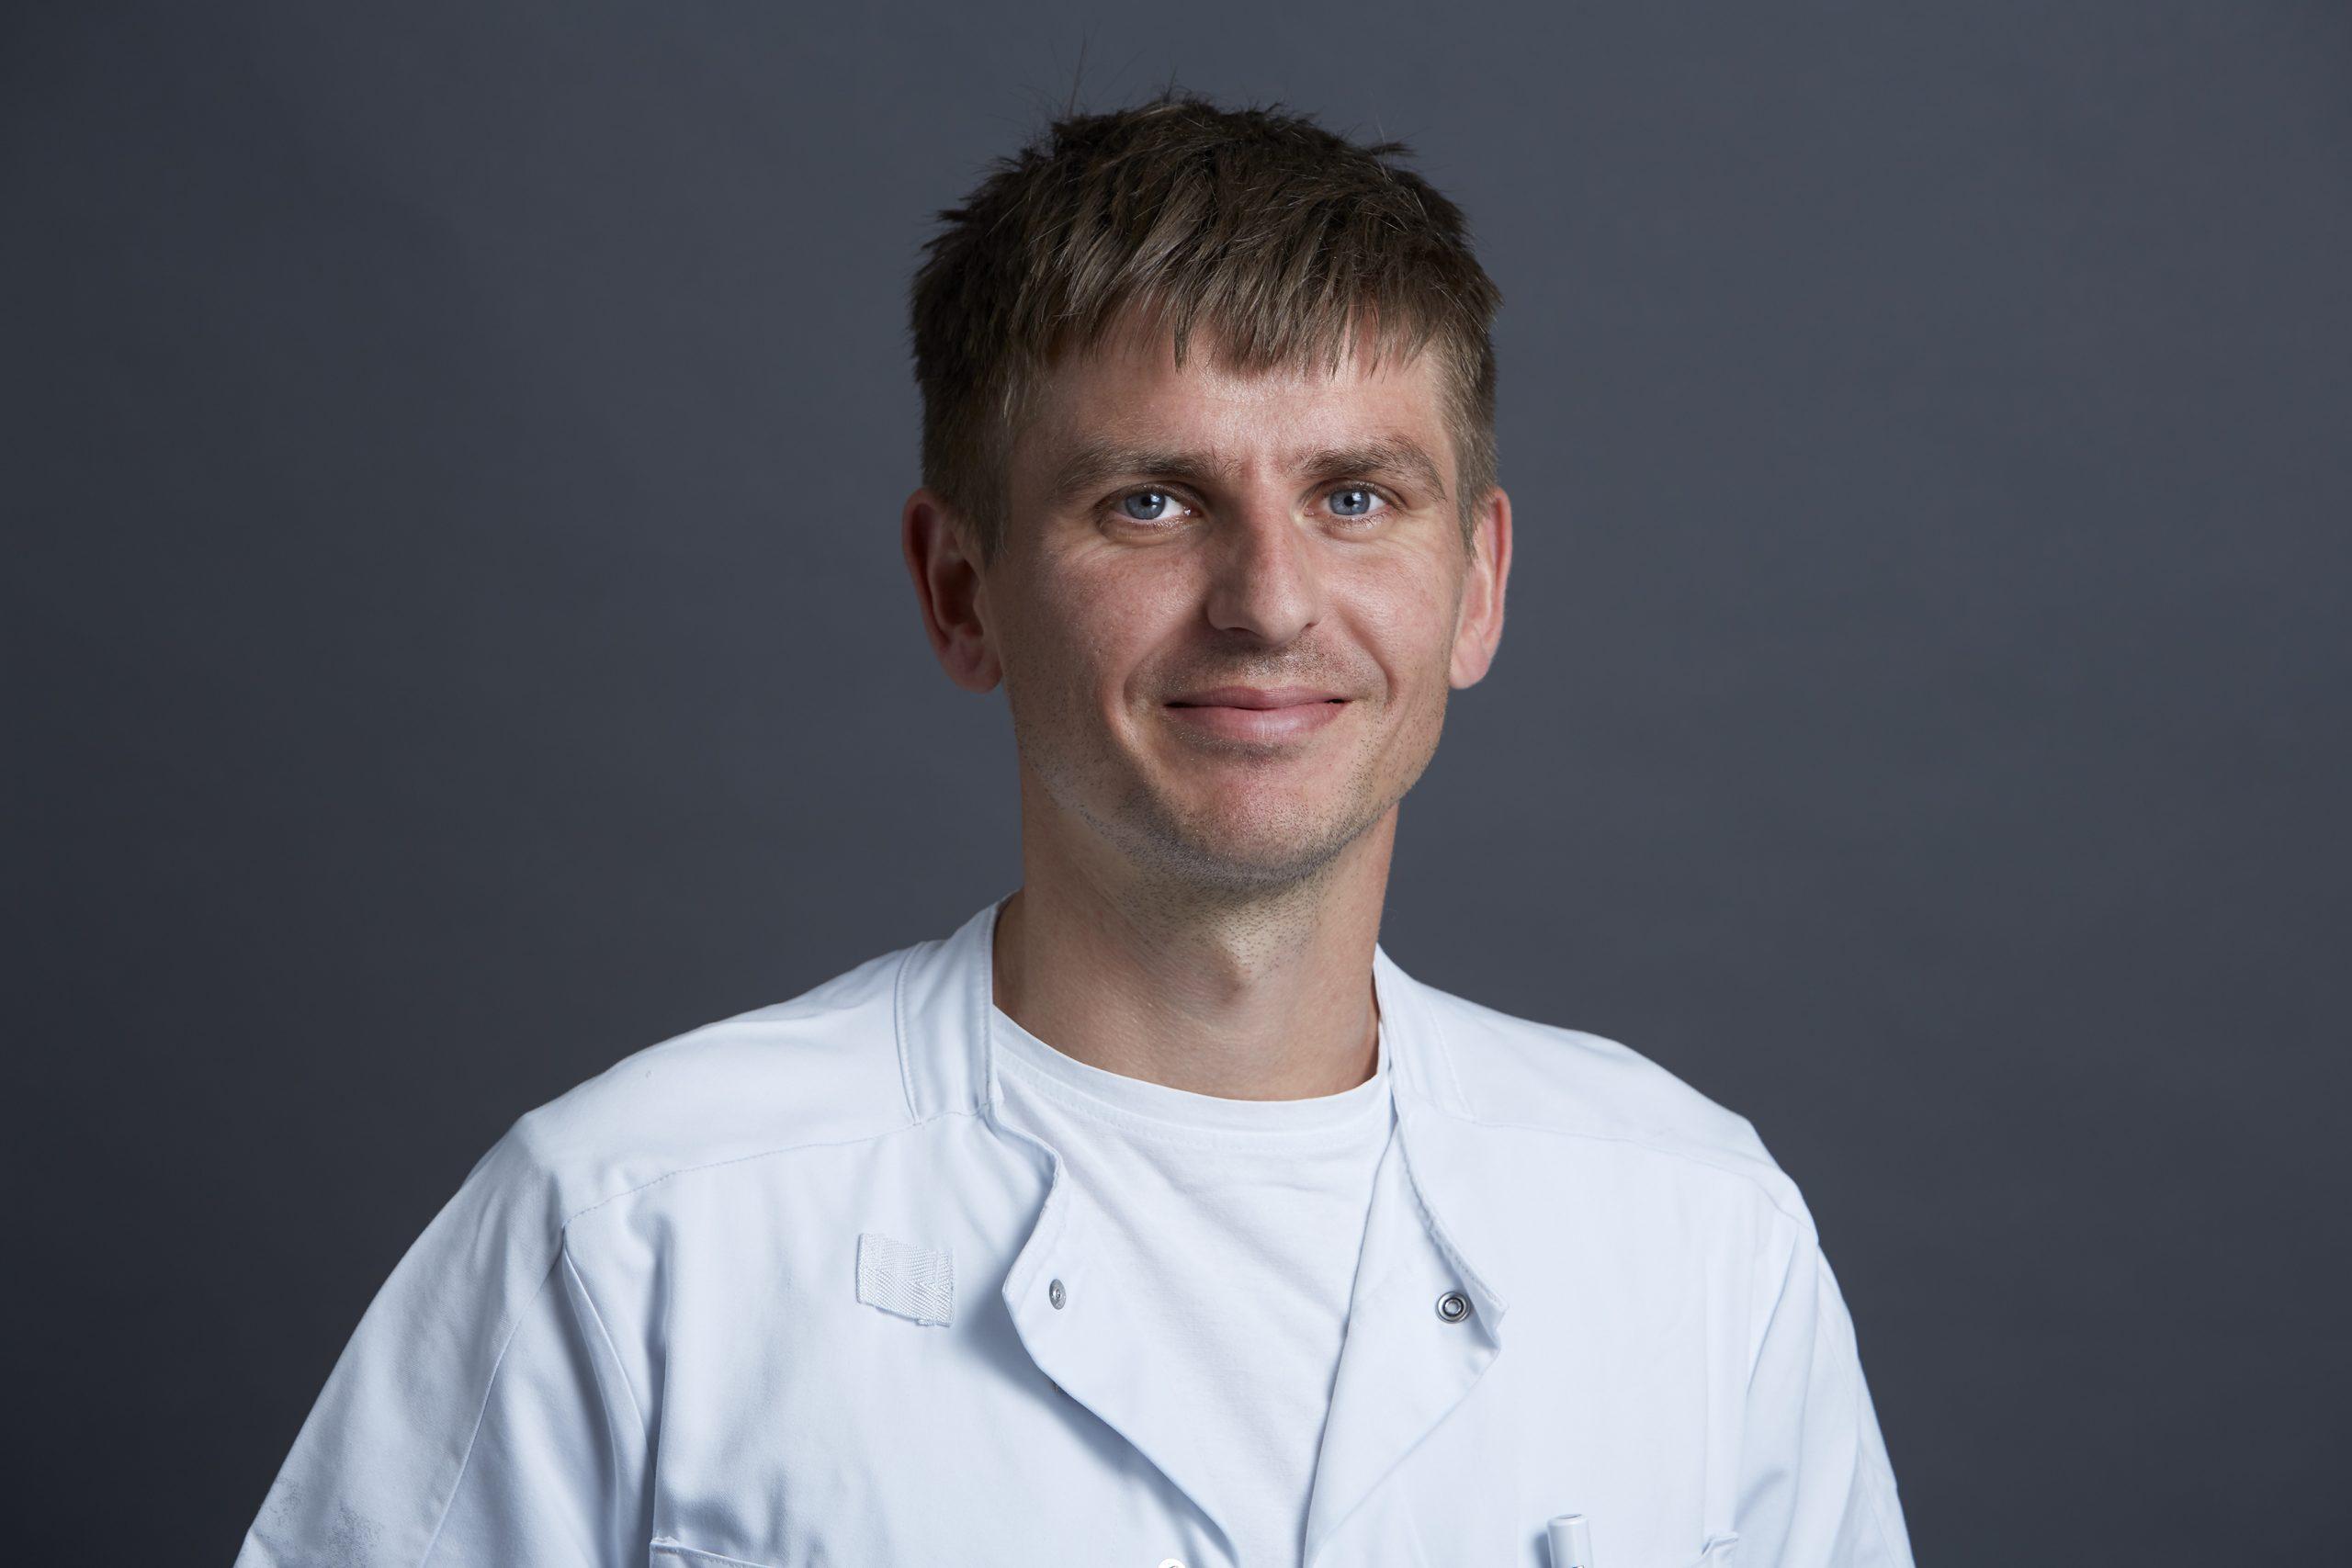 Morten_Hvidtfeldt_ALR9241